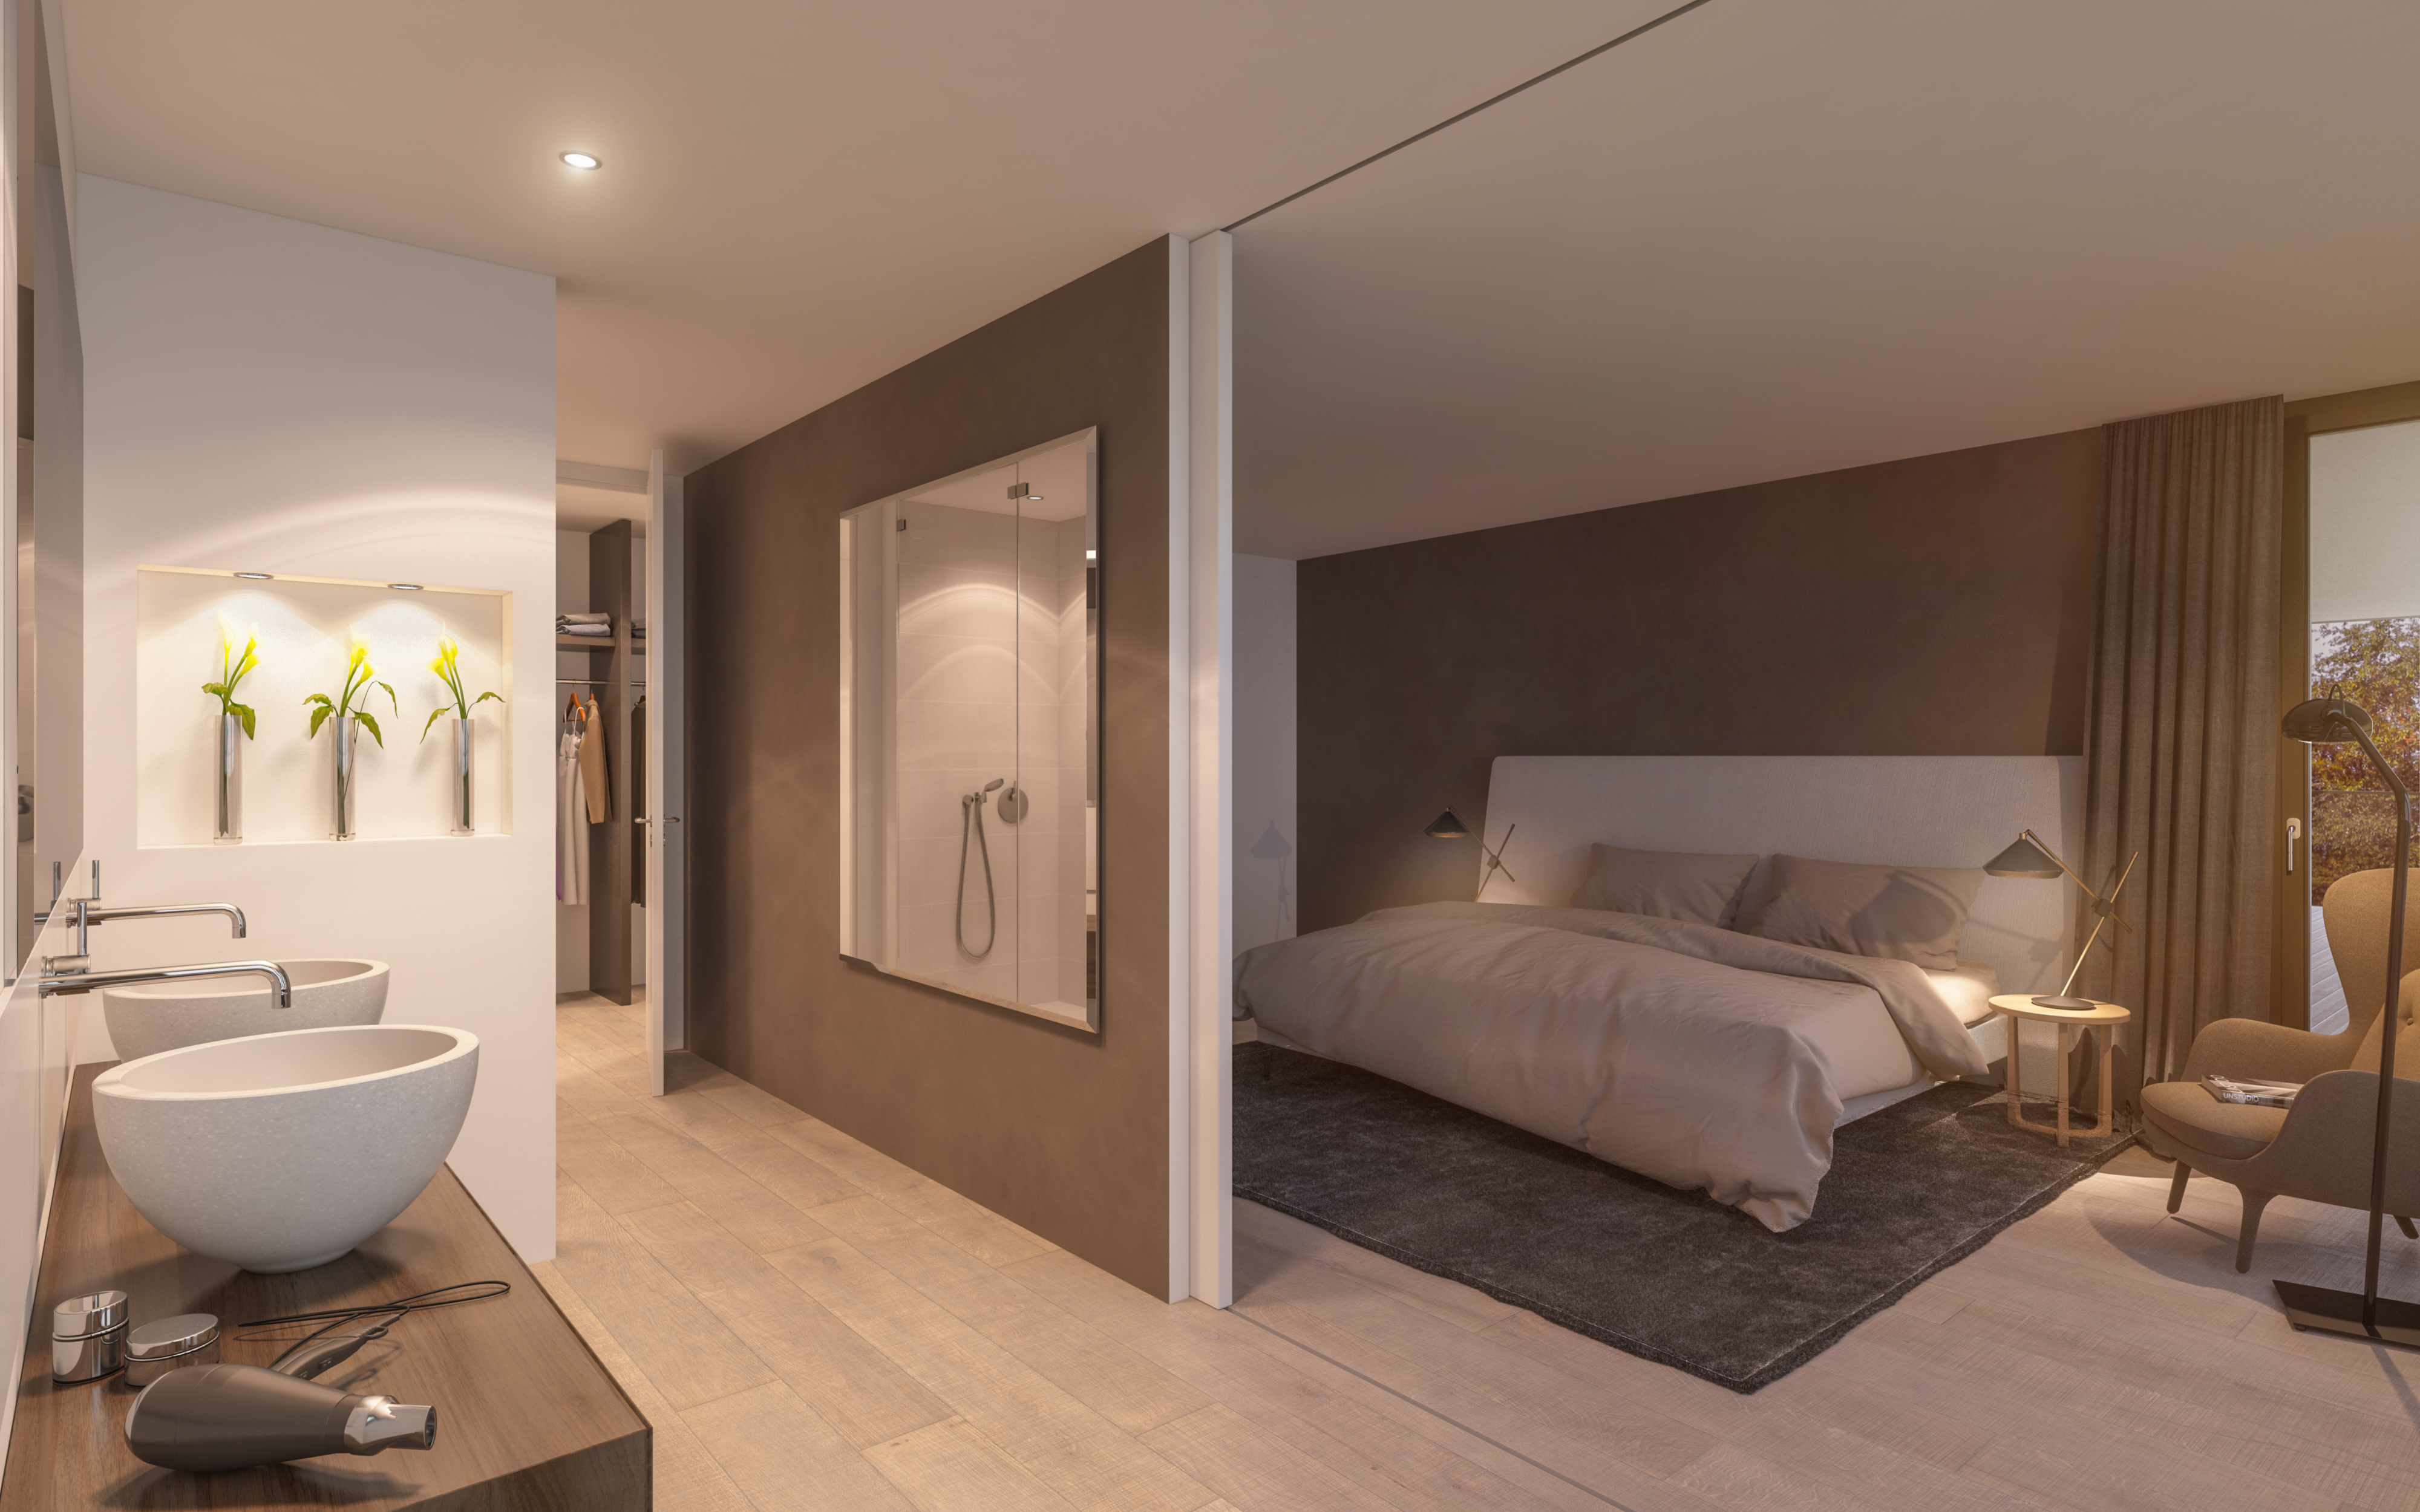 Etagenwohnung B_Bedroom